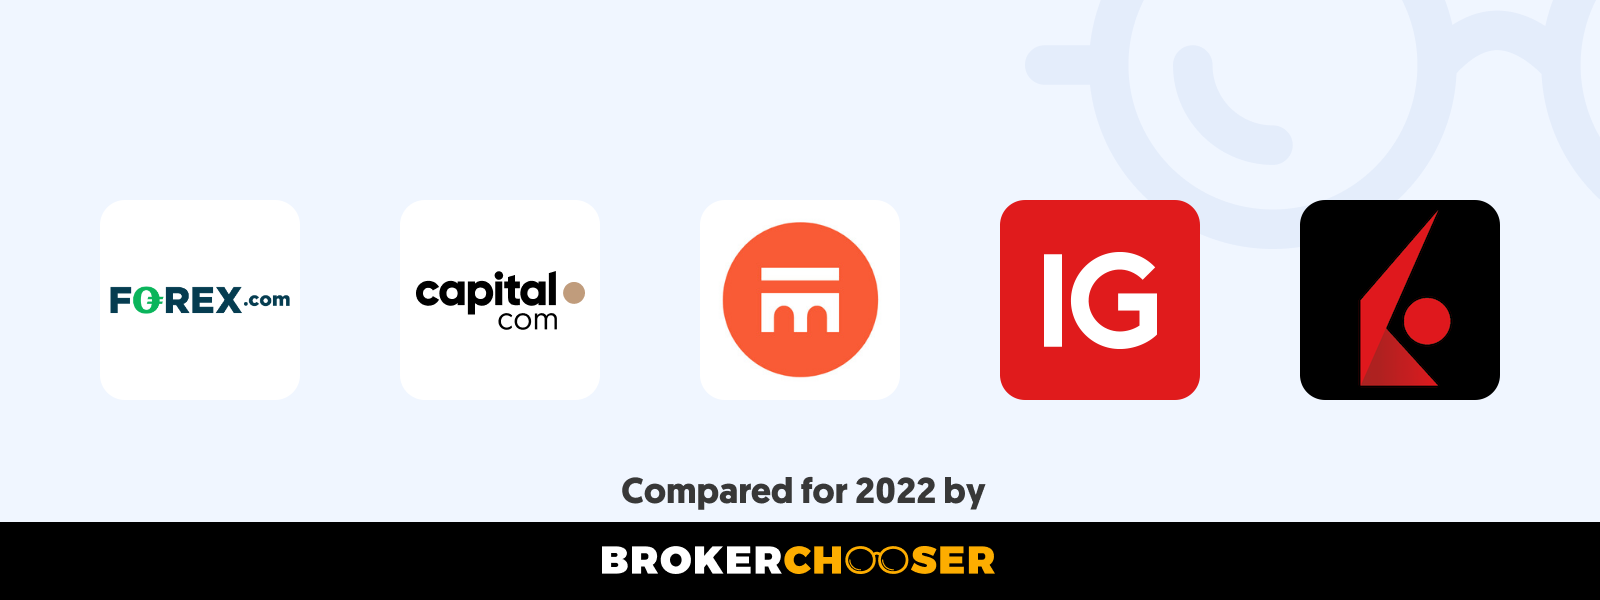 Best forex brokers for beginners in Jamaica in 2021